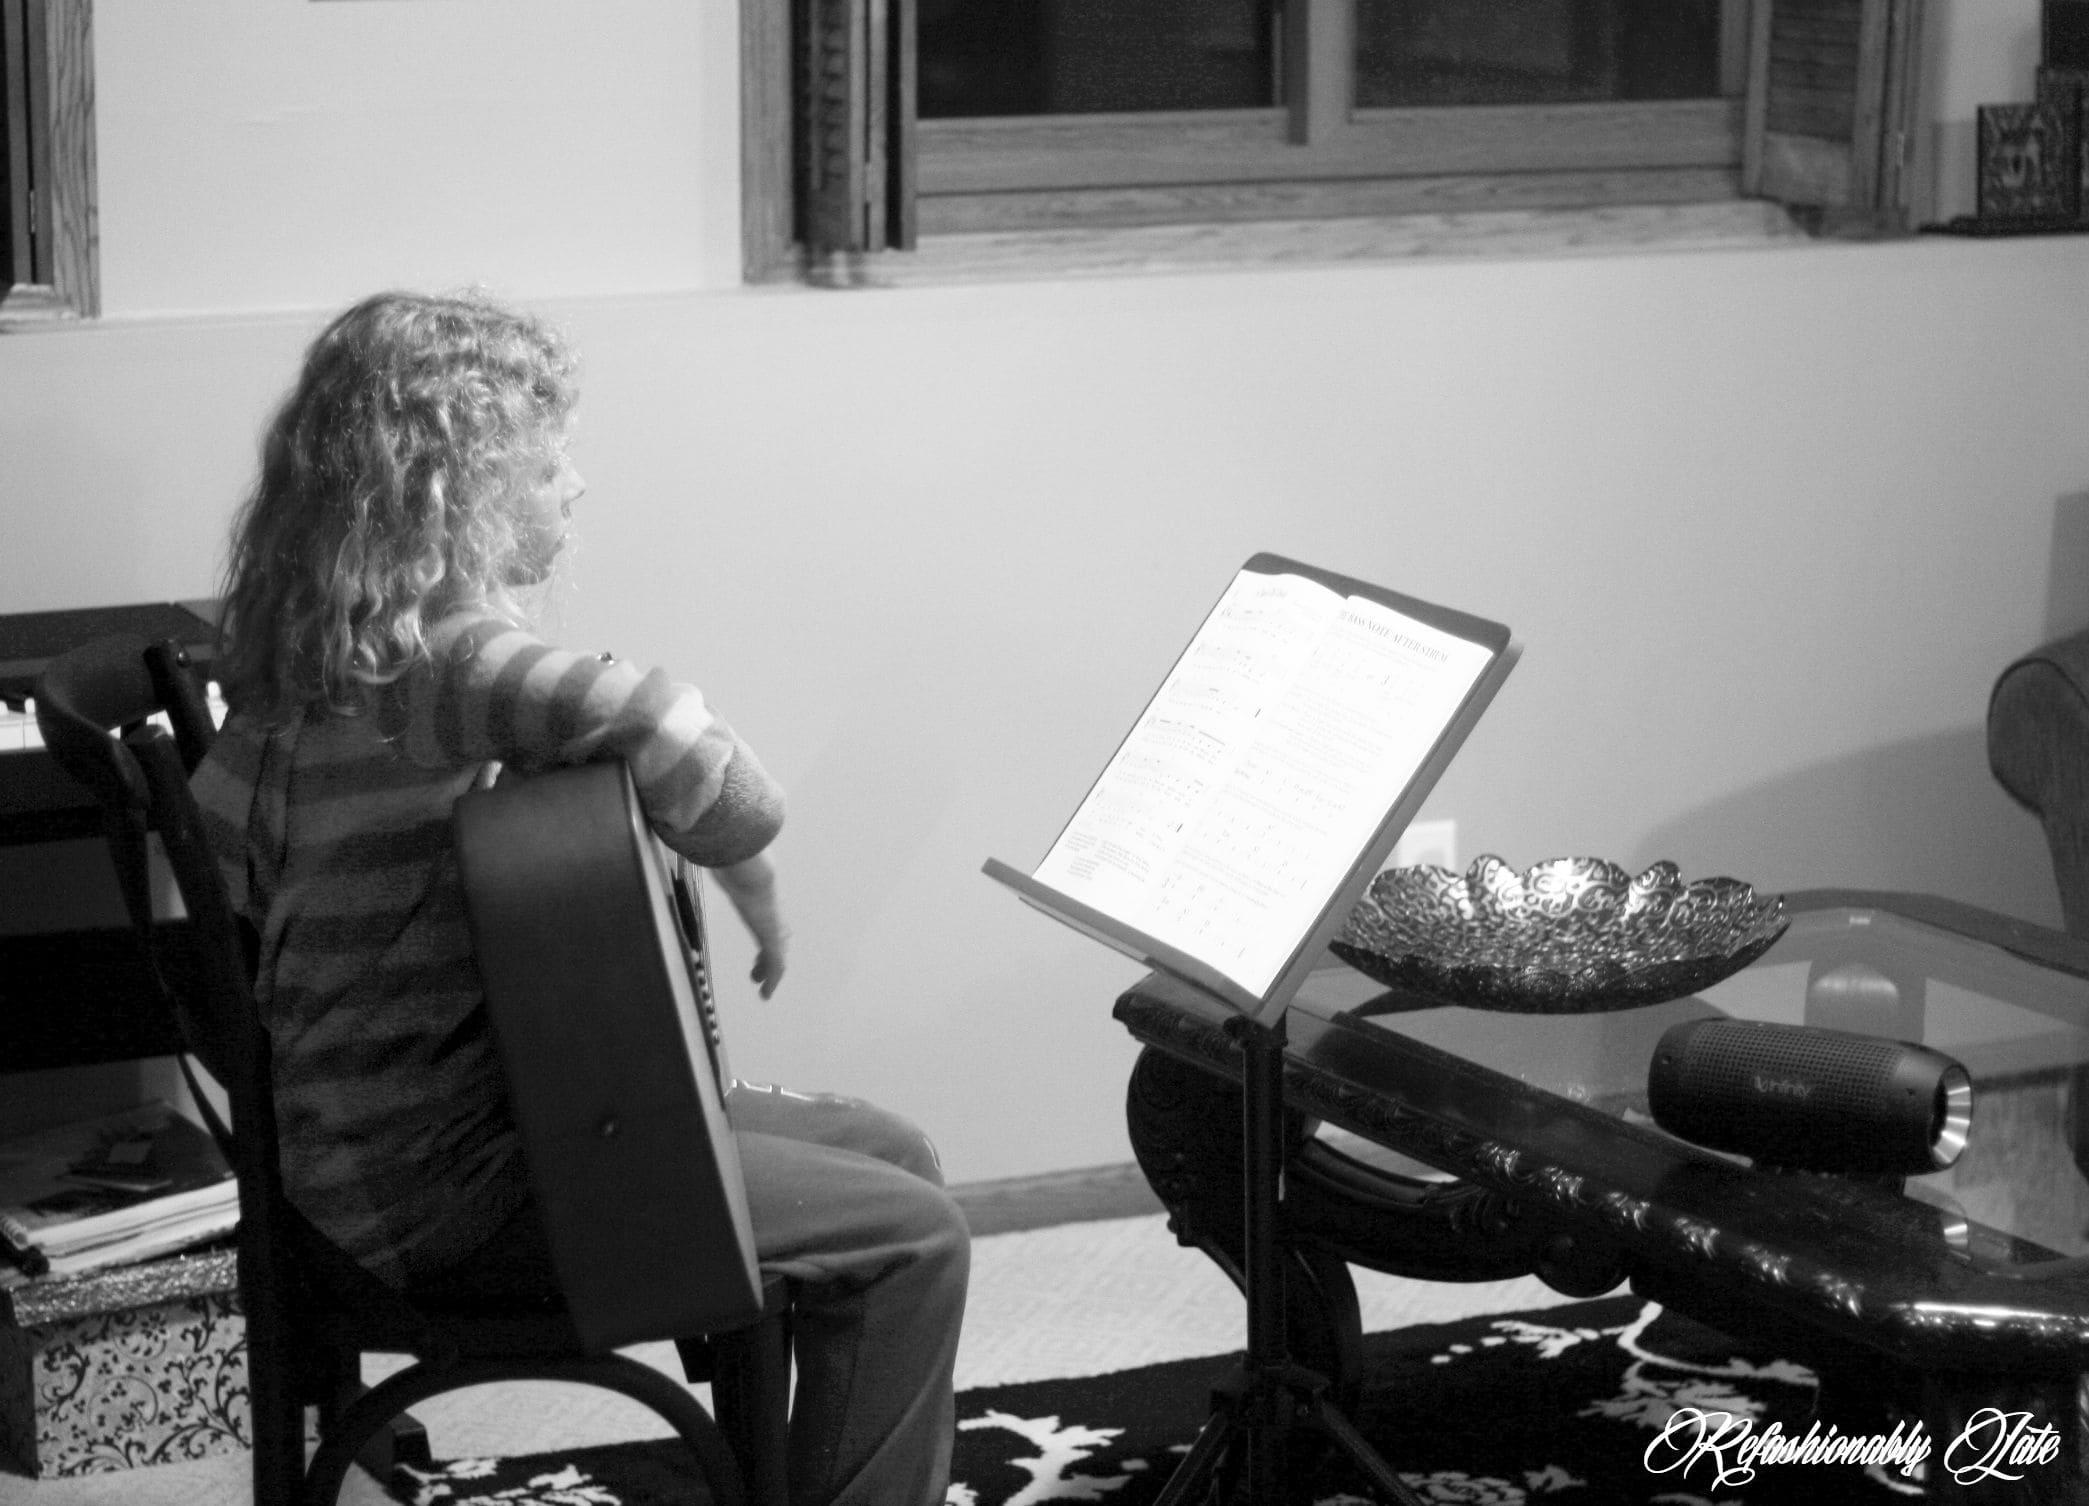 My Musical Life - www.refashionablylate.com